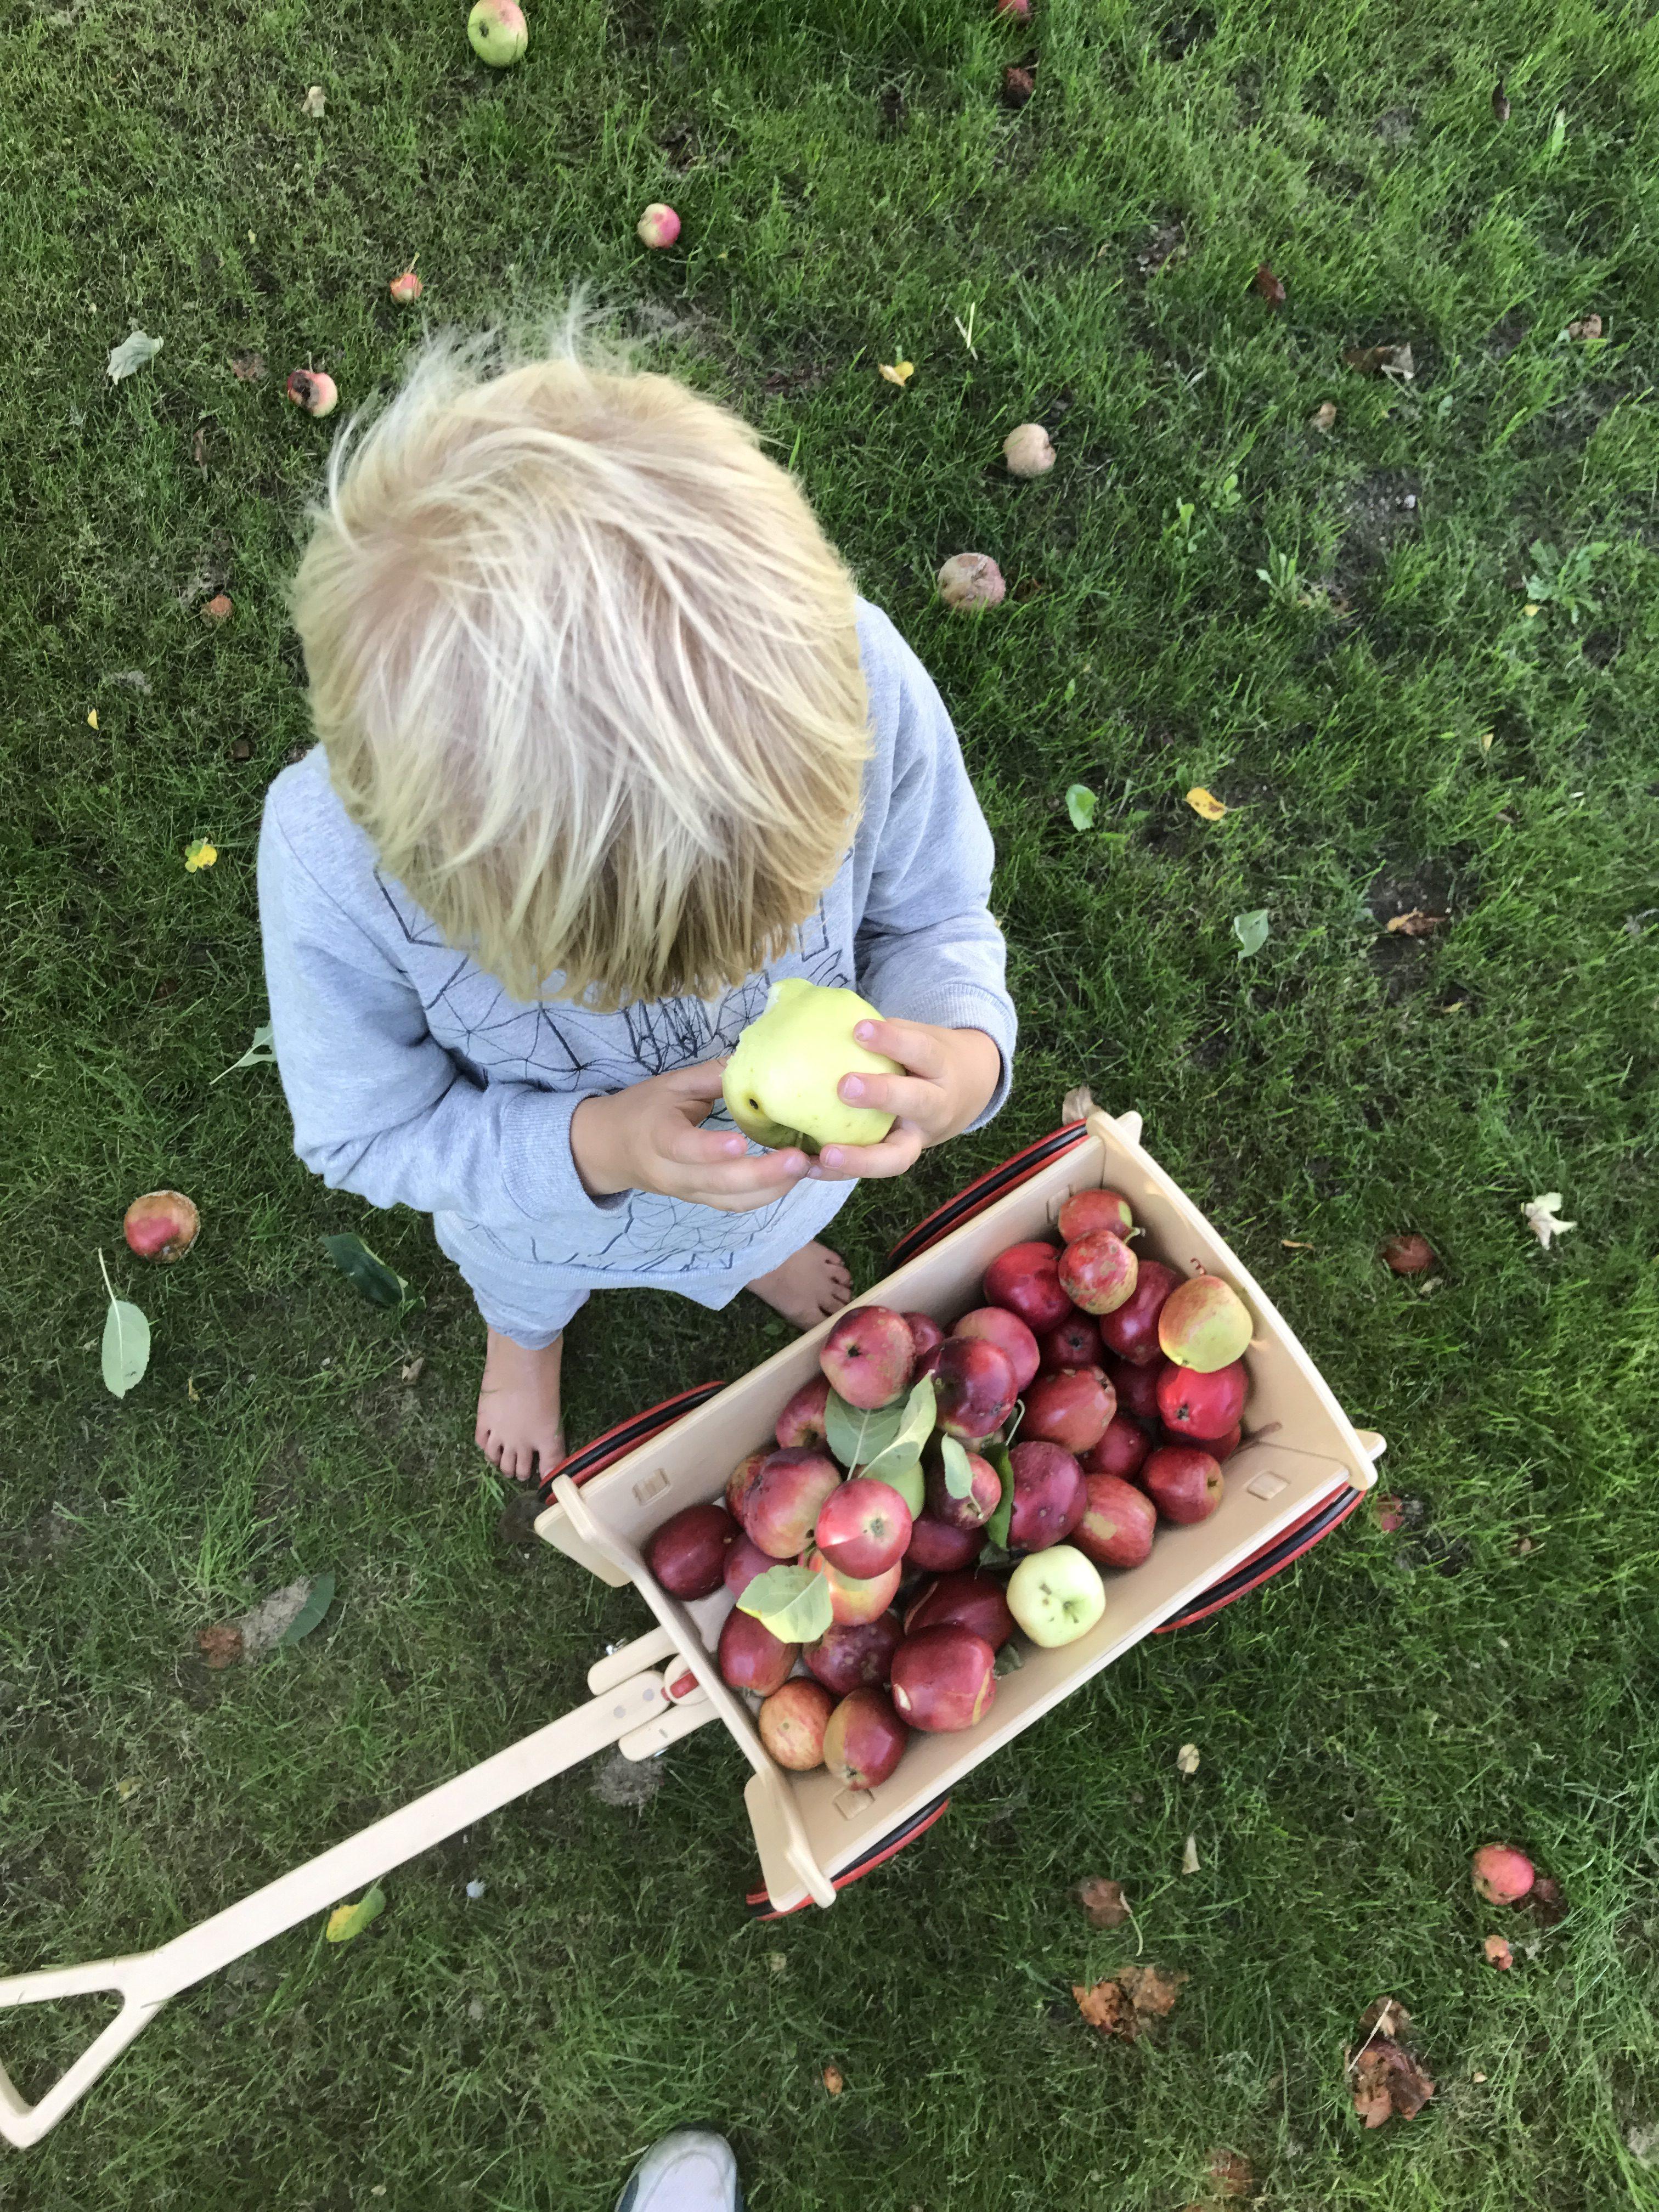 æblerov æblemost